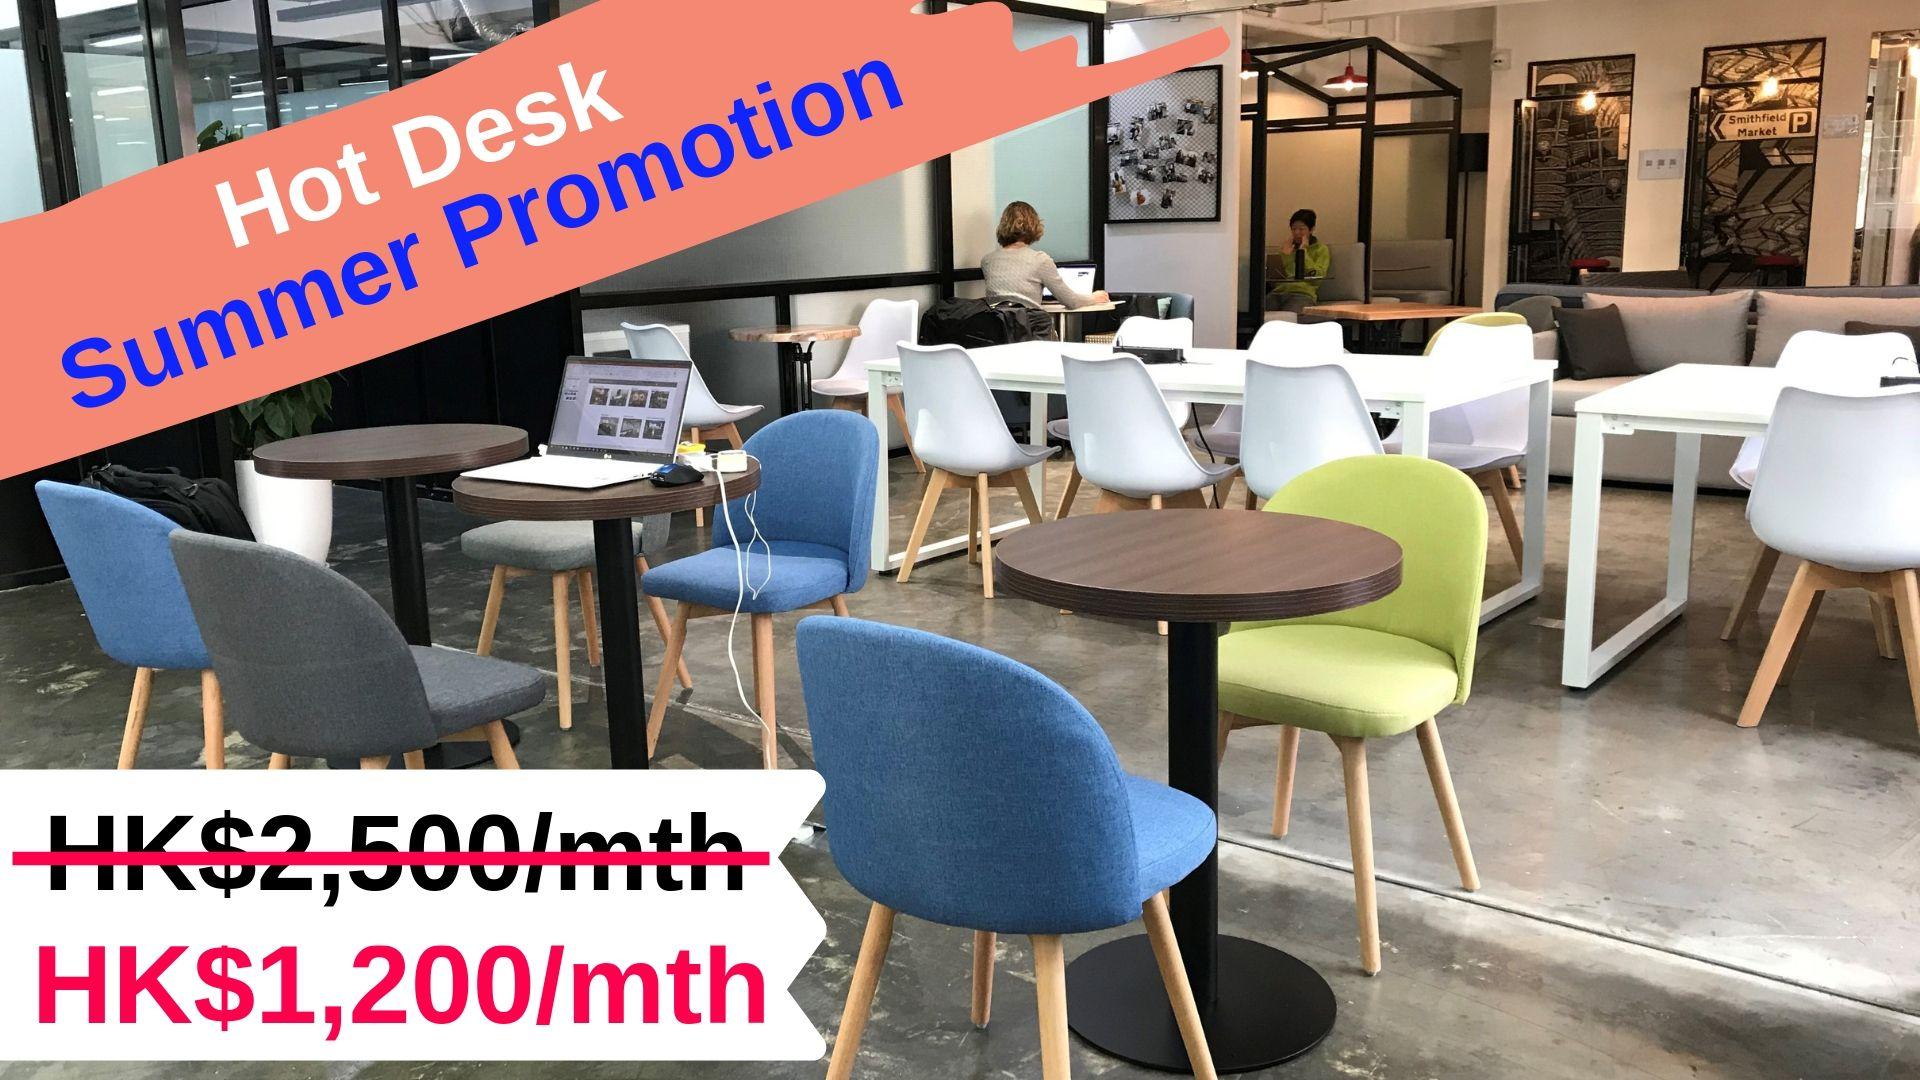 summer promotion hotdesk.jpg